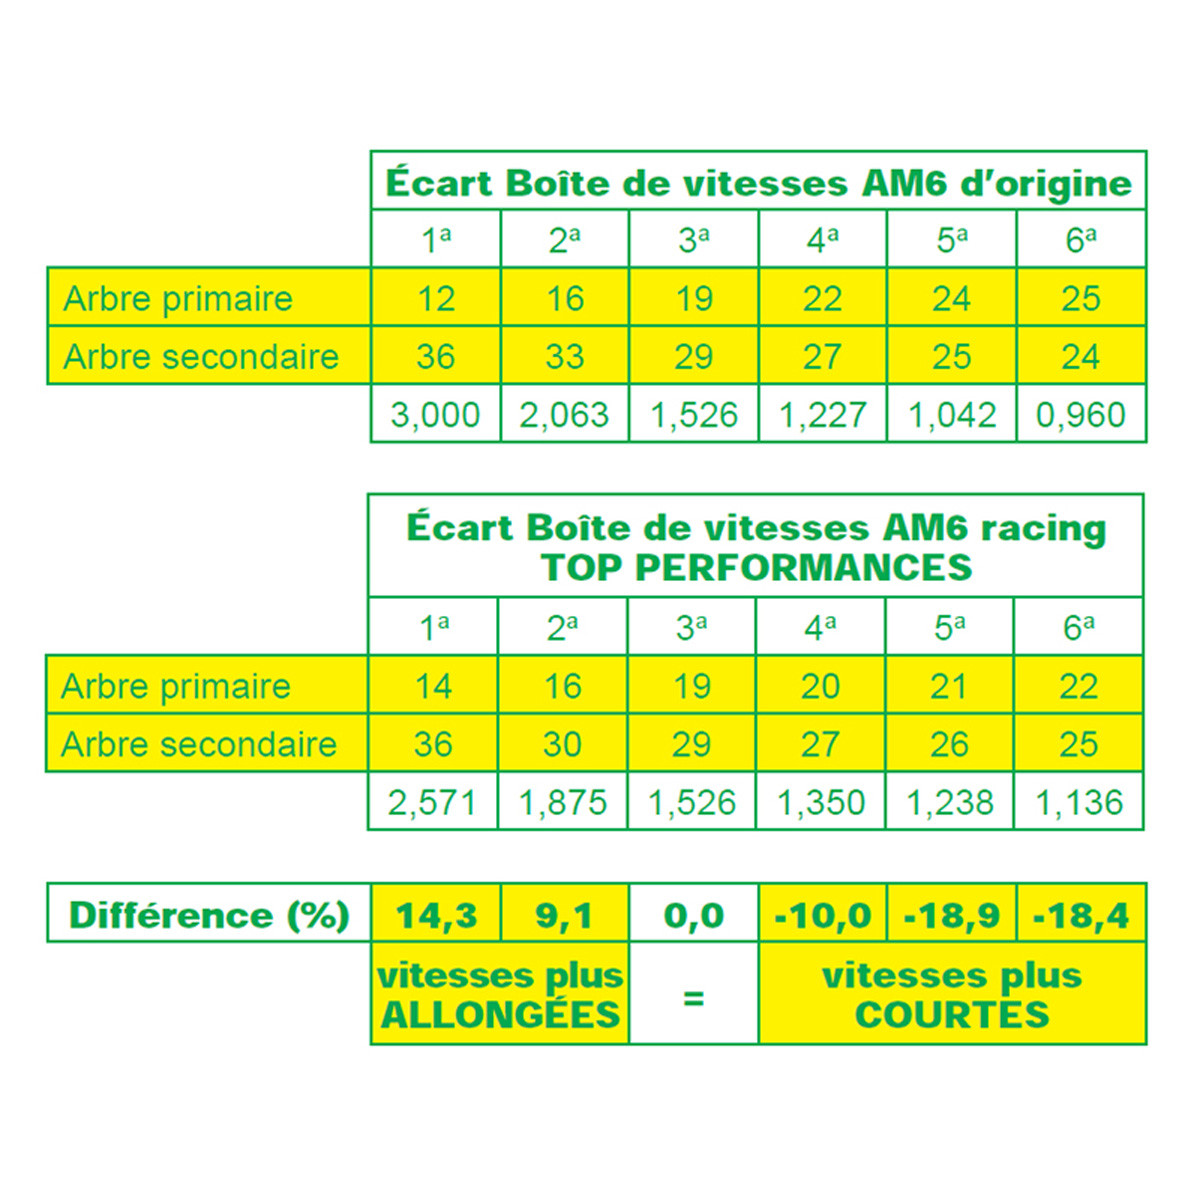 Boite de Vitesse AM6 - TOP PERF